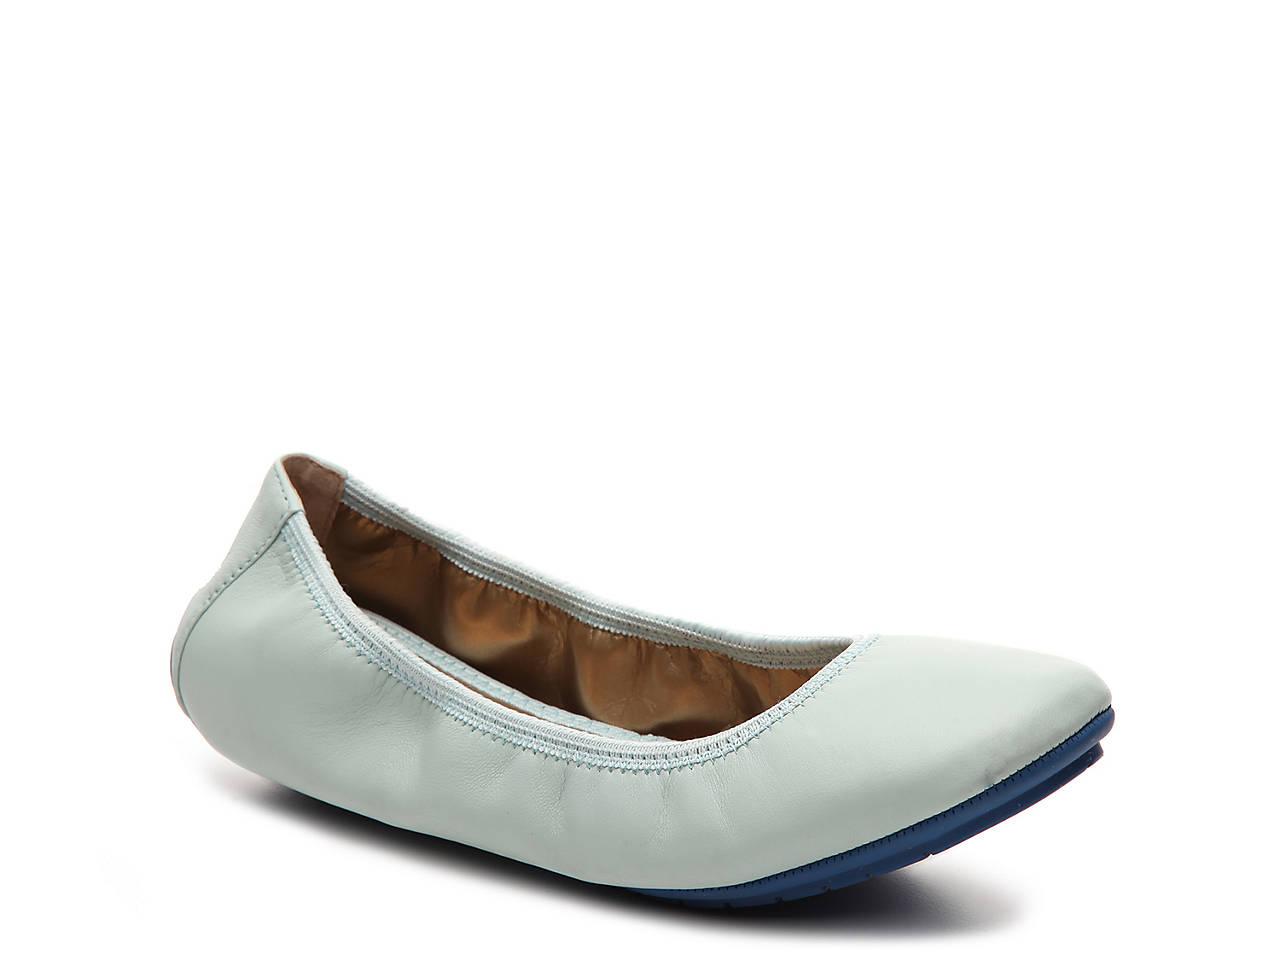 76b983bb1a Me Too Tru Blu Ballet Flat Men s Shoes